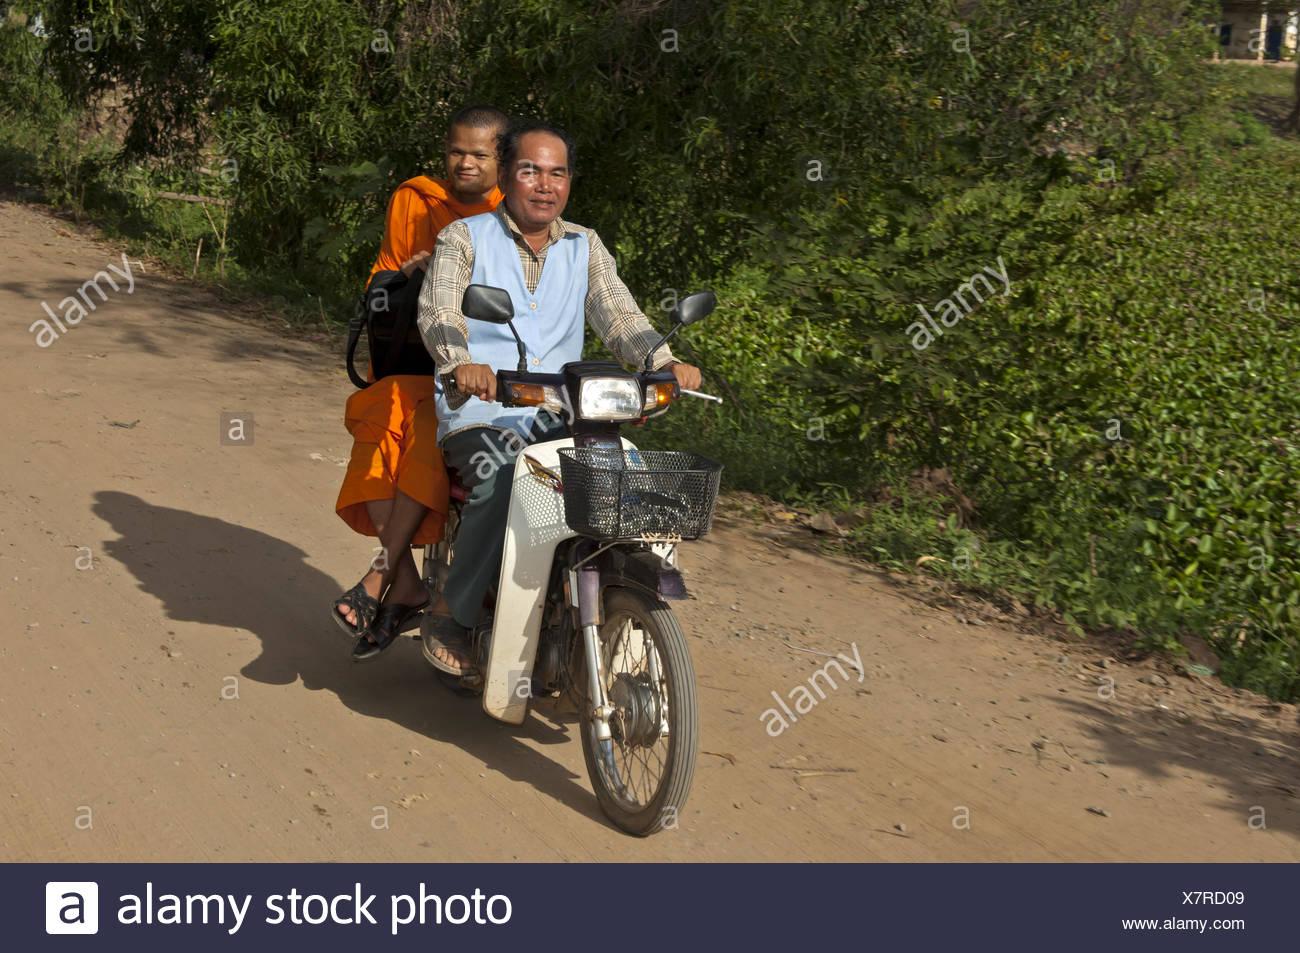 Buddhist monk riding as passenger on a motor-bike Stock Photo